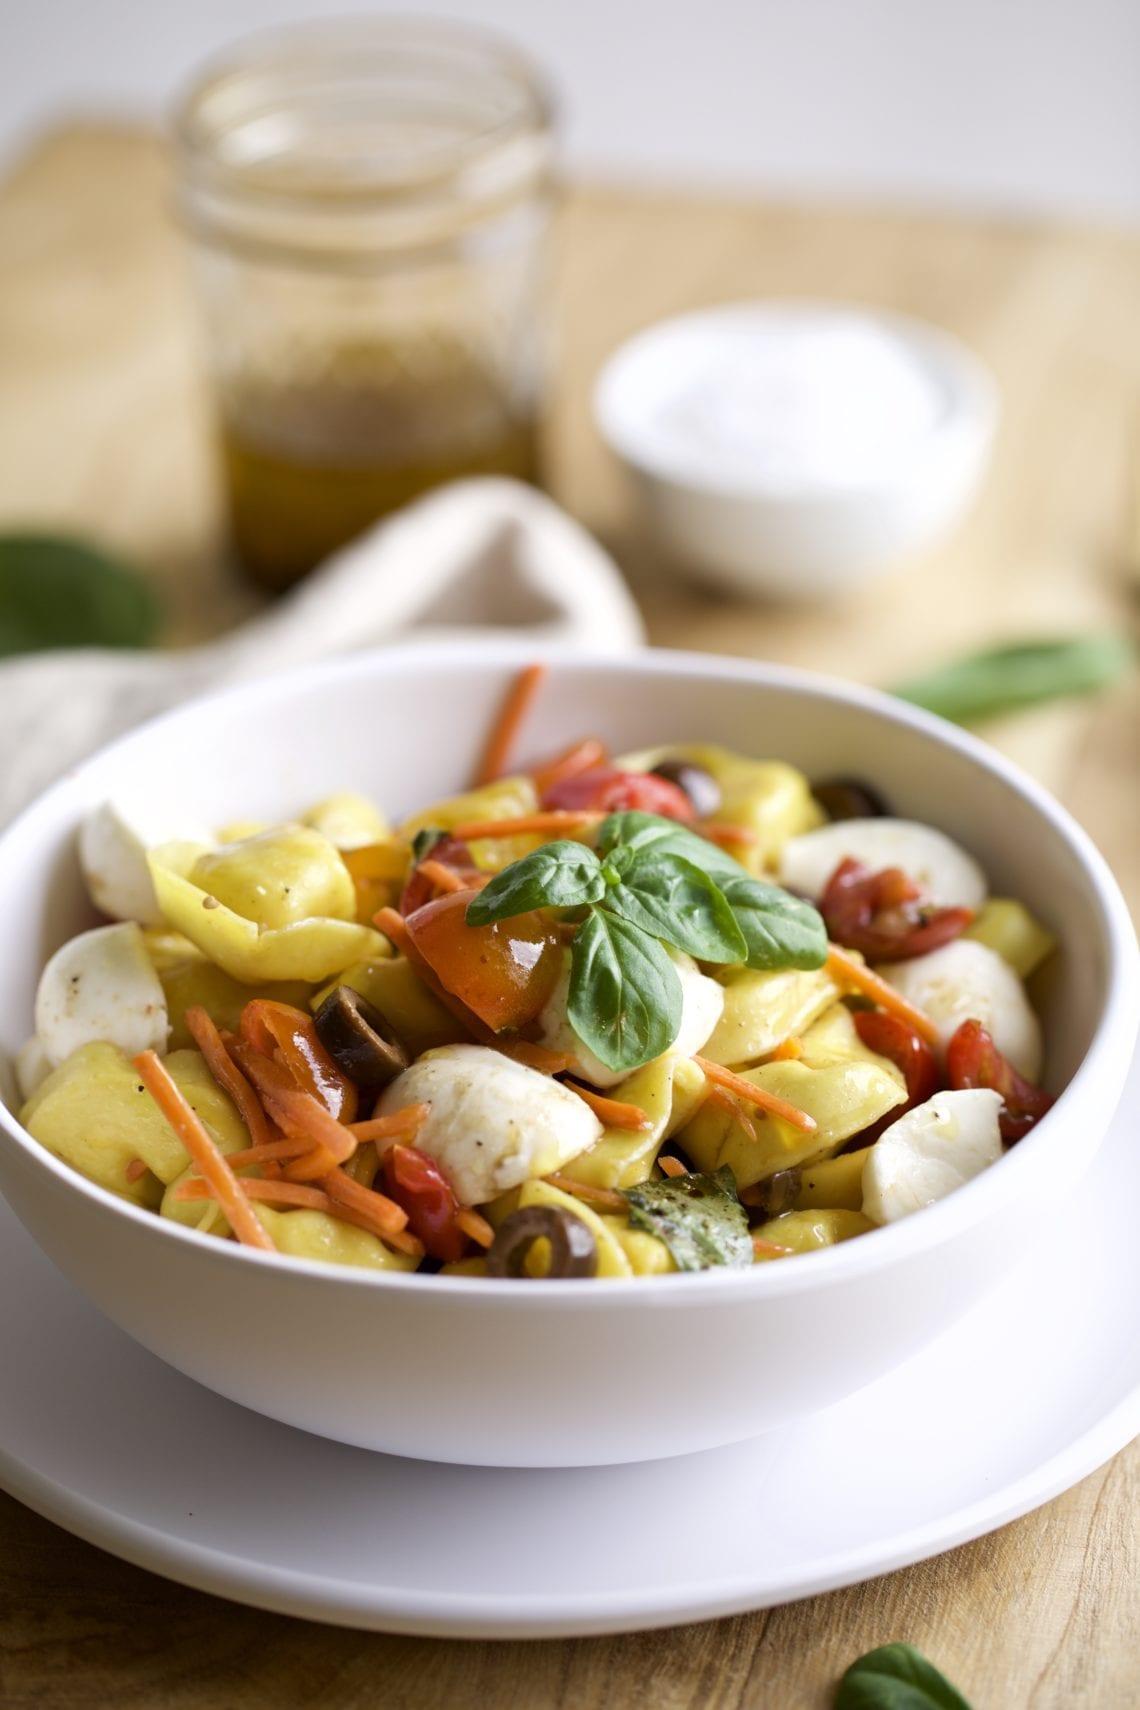 Easy Italian Tortellini Pasta Salad Recipe in a bowl